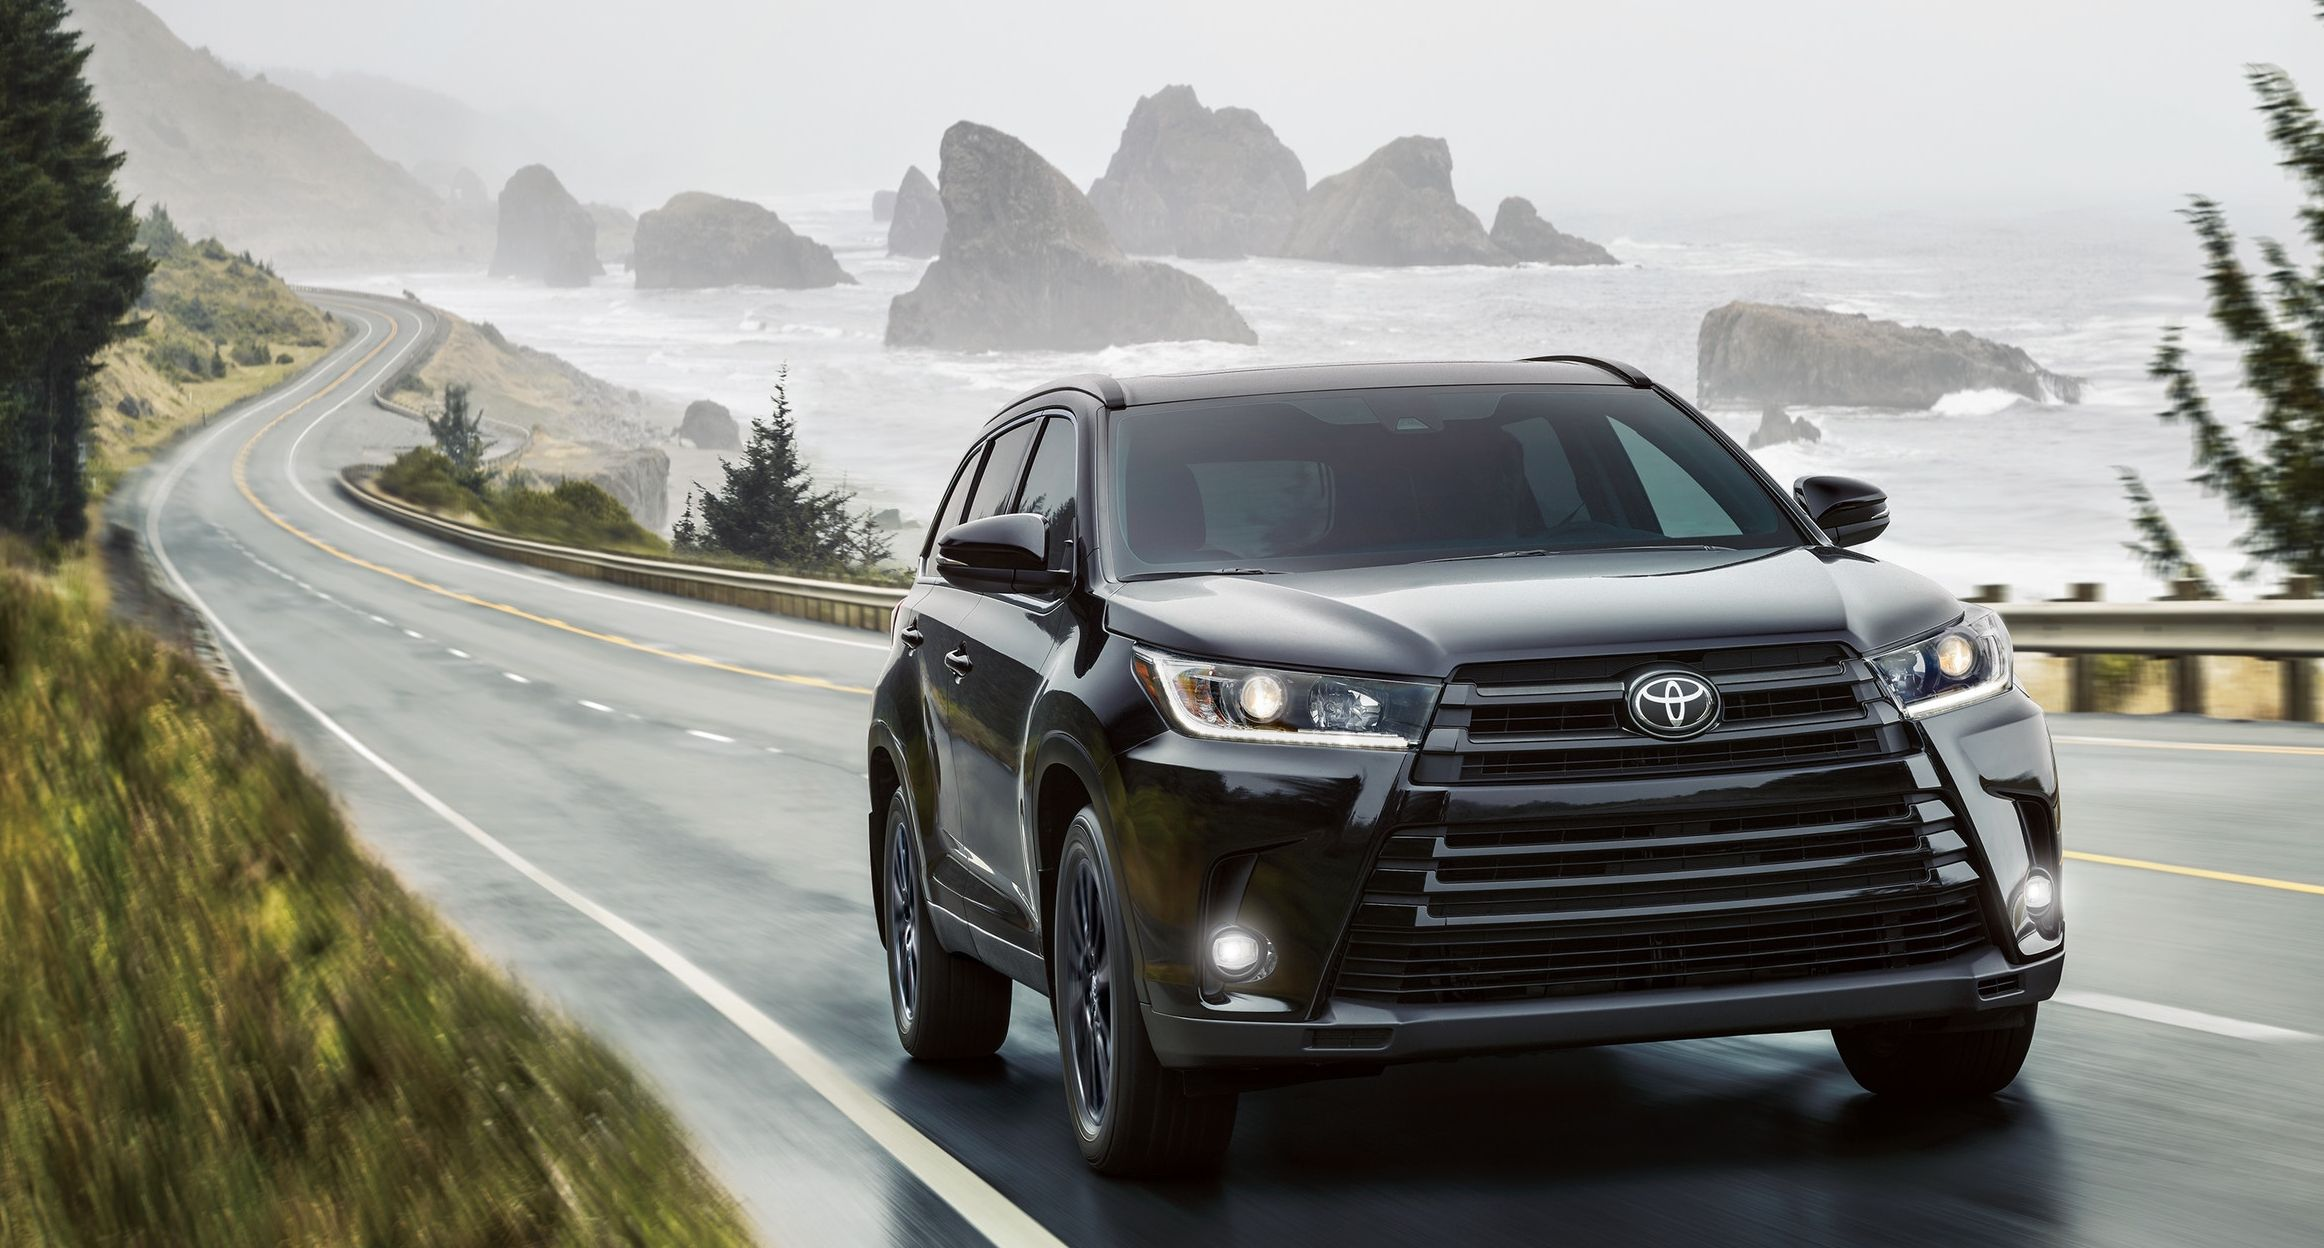 2019 Toyota Highlander for Sale near Overland Park, KS